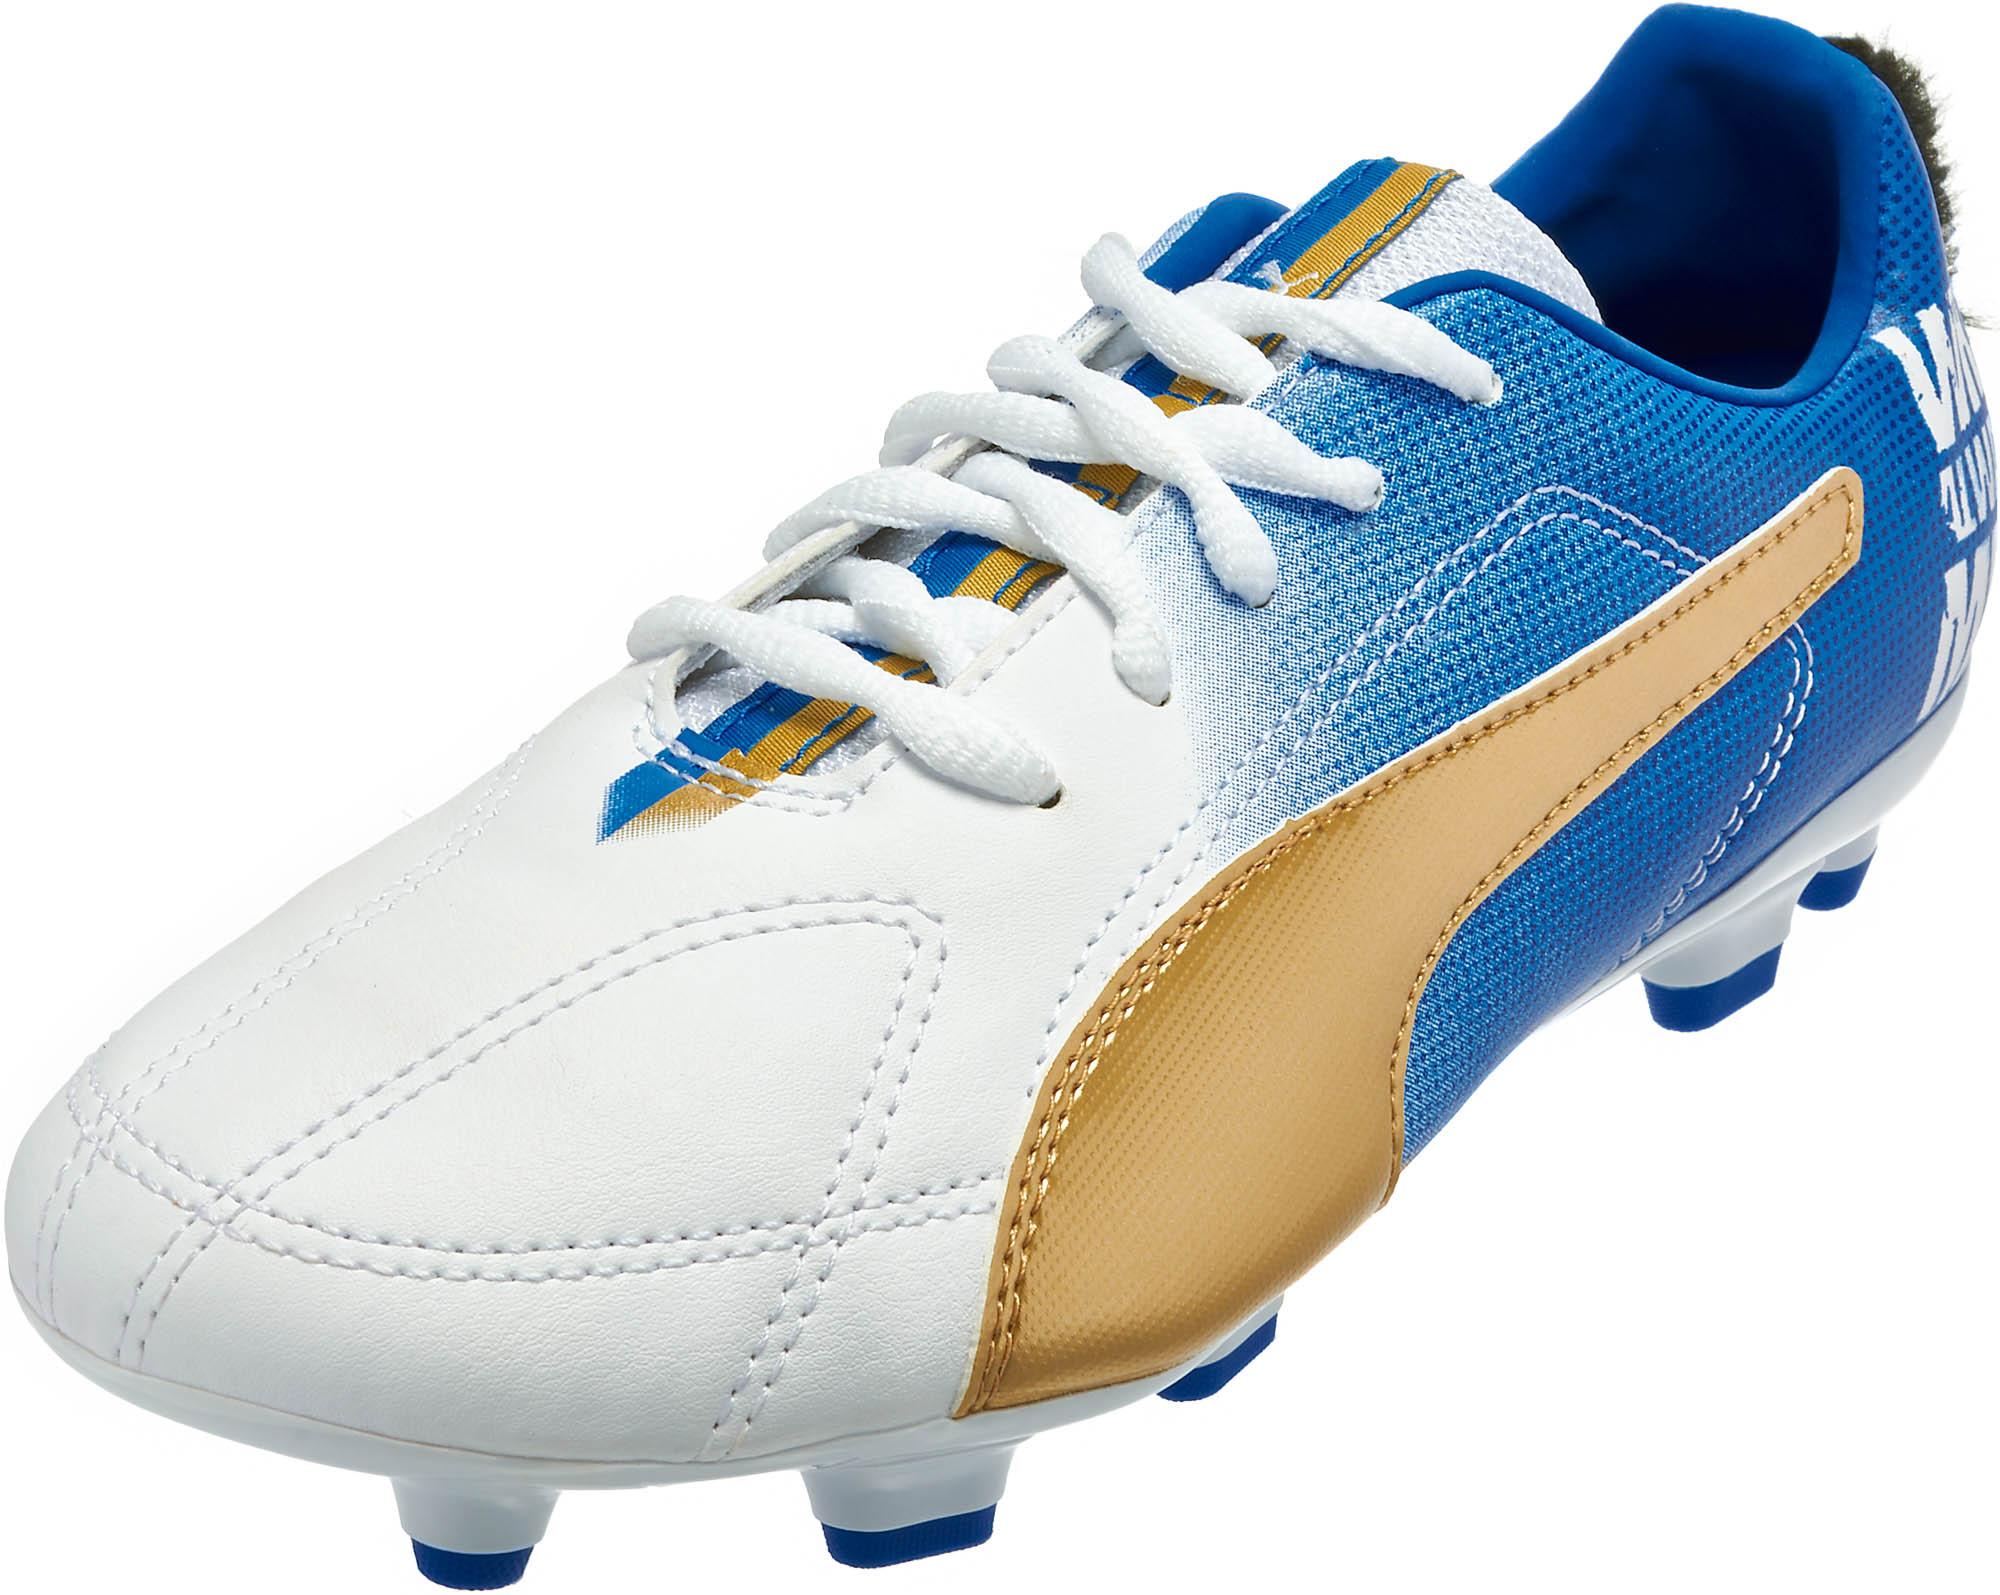 Puma Kids Mario Balotelli Soccer Cleats - Puma MB9 FG Jr ed759c467